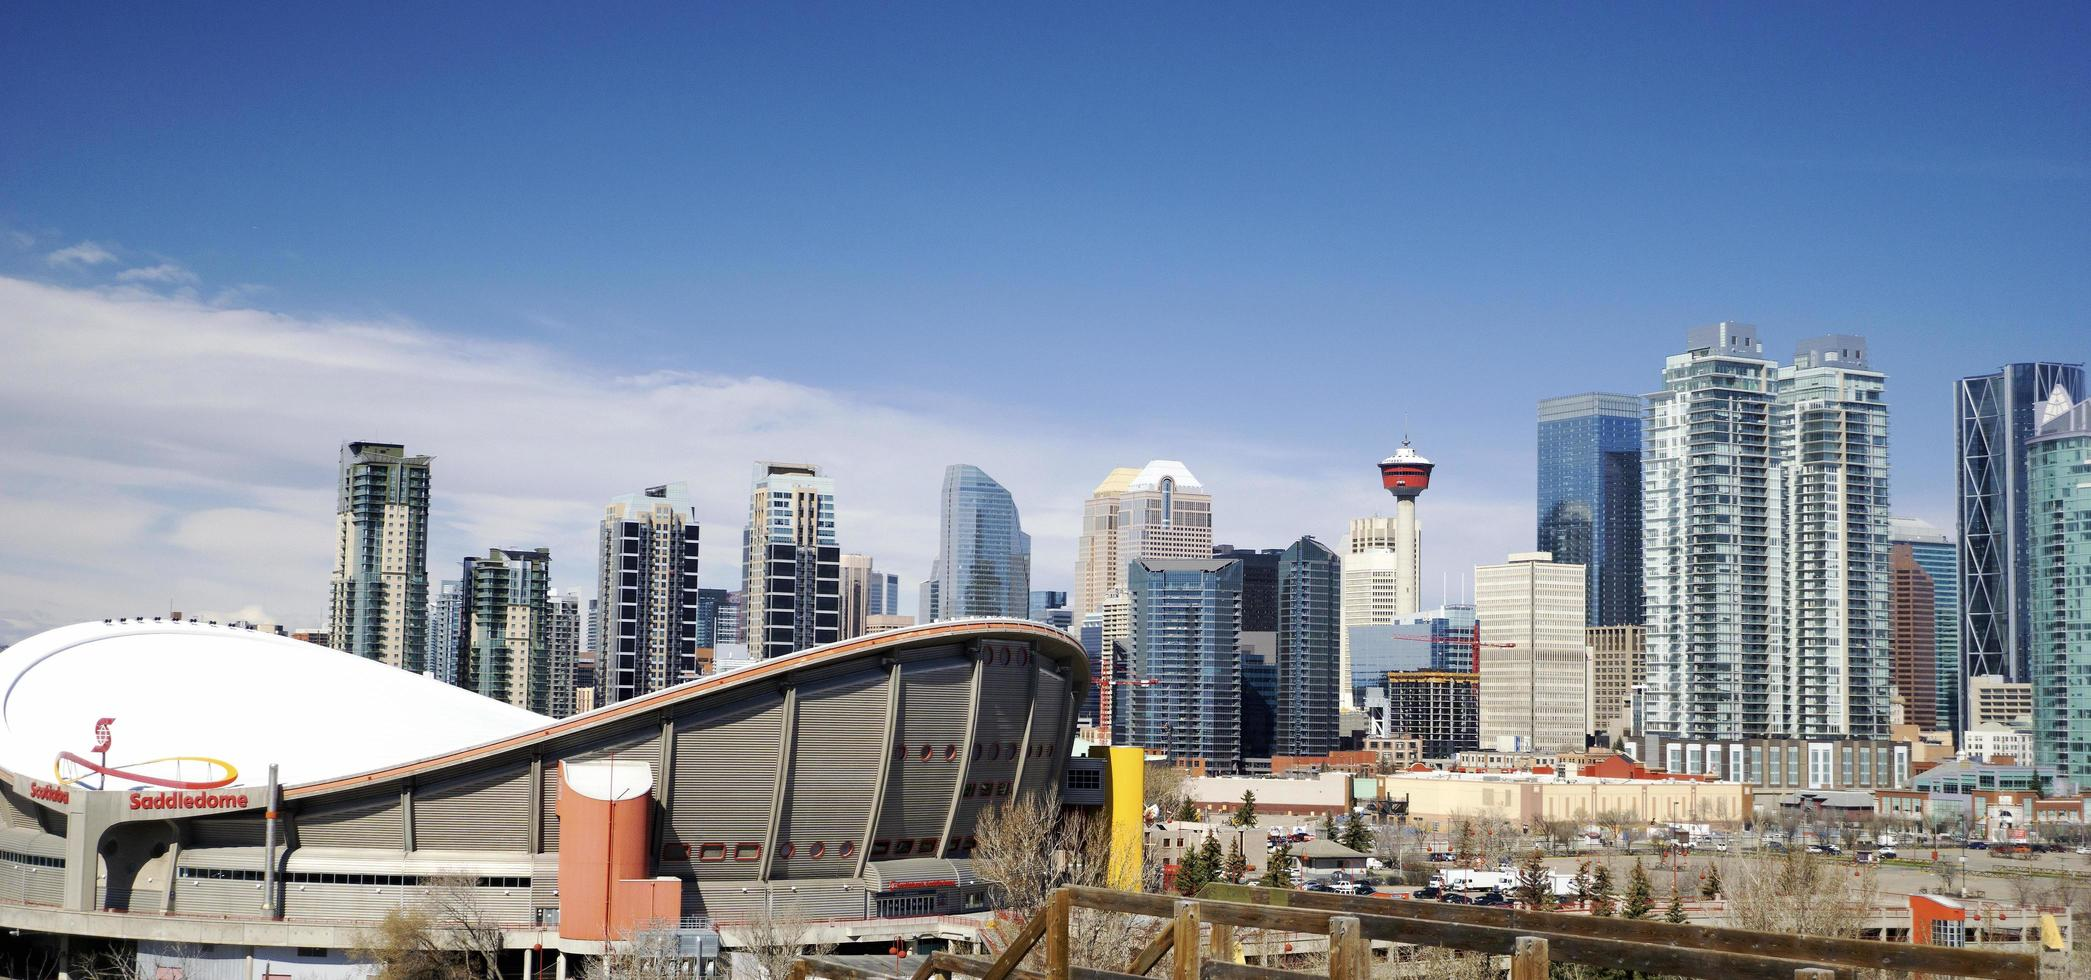 alberta, canadá, 2020 - centro de alberta durante o dia foto